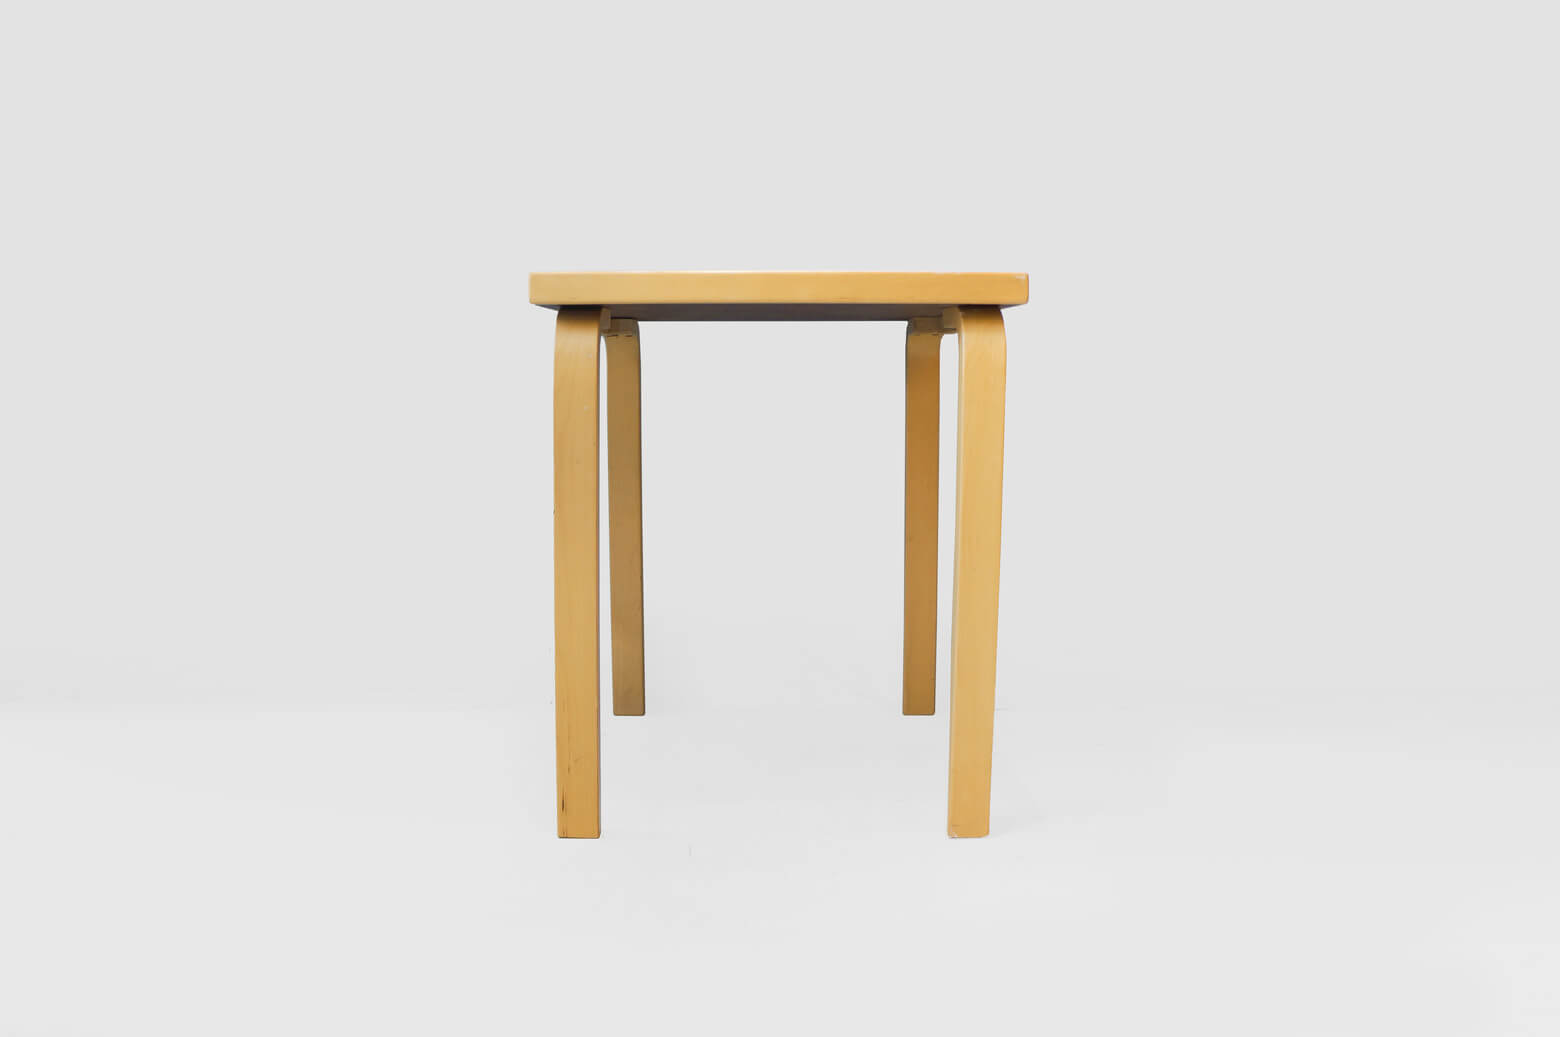 Vintage artek table 80C Alvar Aalto design/ヴィンテージ アルテック テーブル80C アルヴァ・アアルト デザイン 2